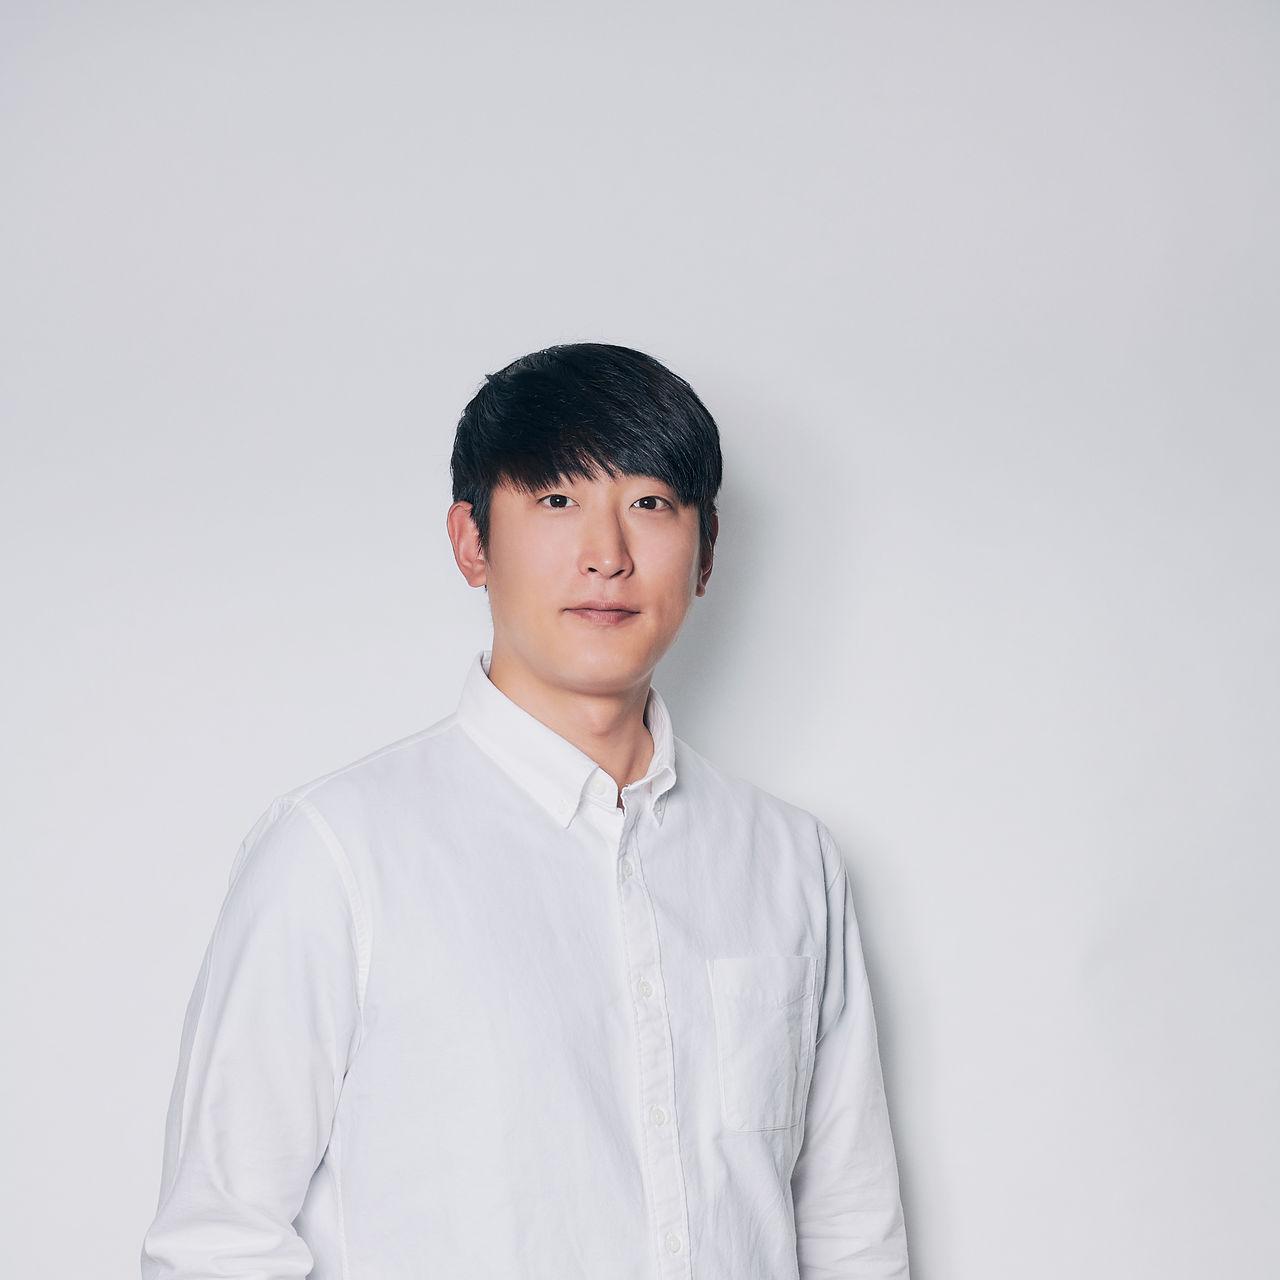 <b>Kim Sung Tae</b><br>Lead Fundraiser<br>